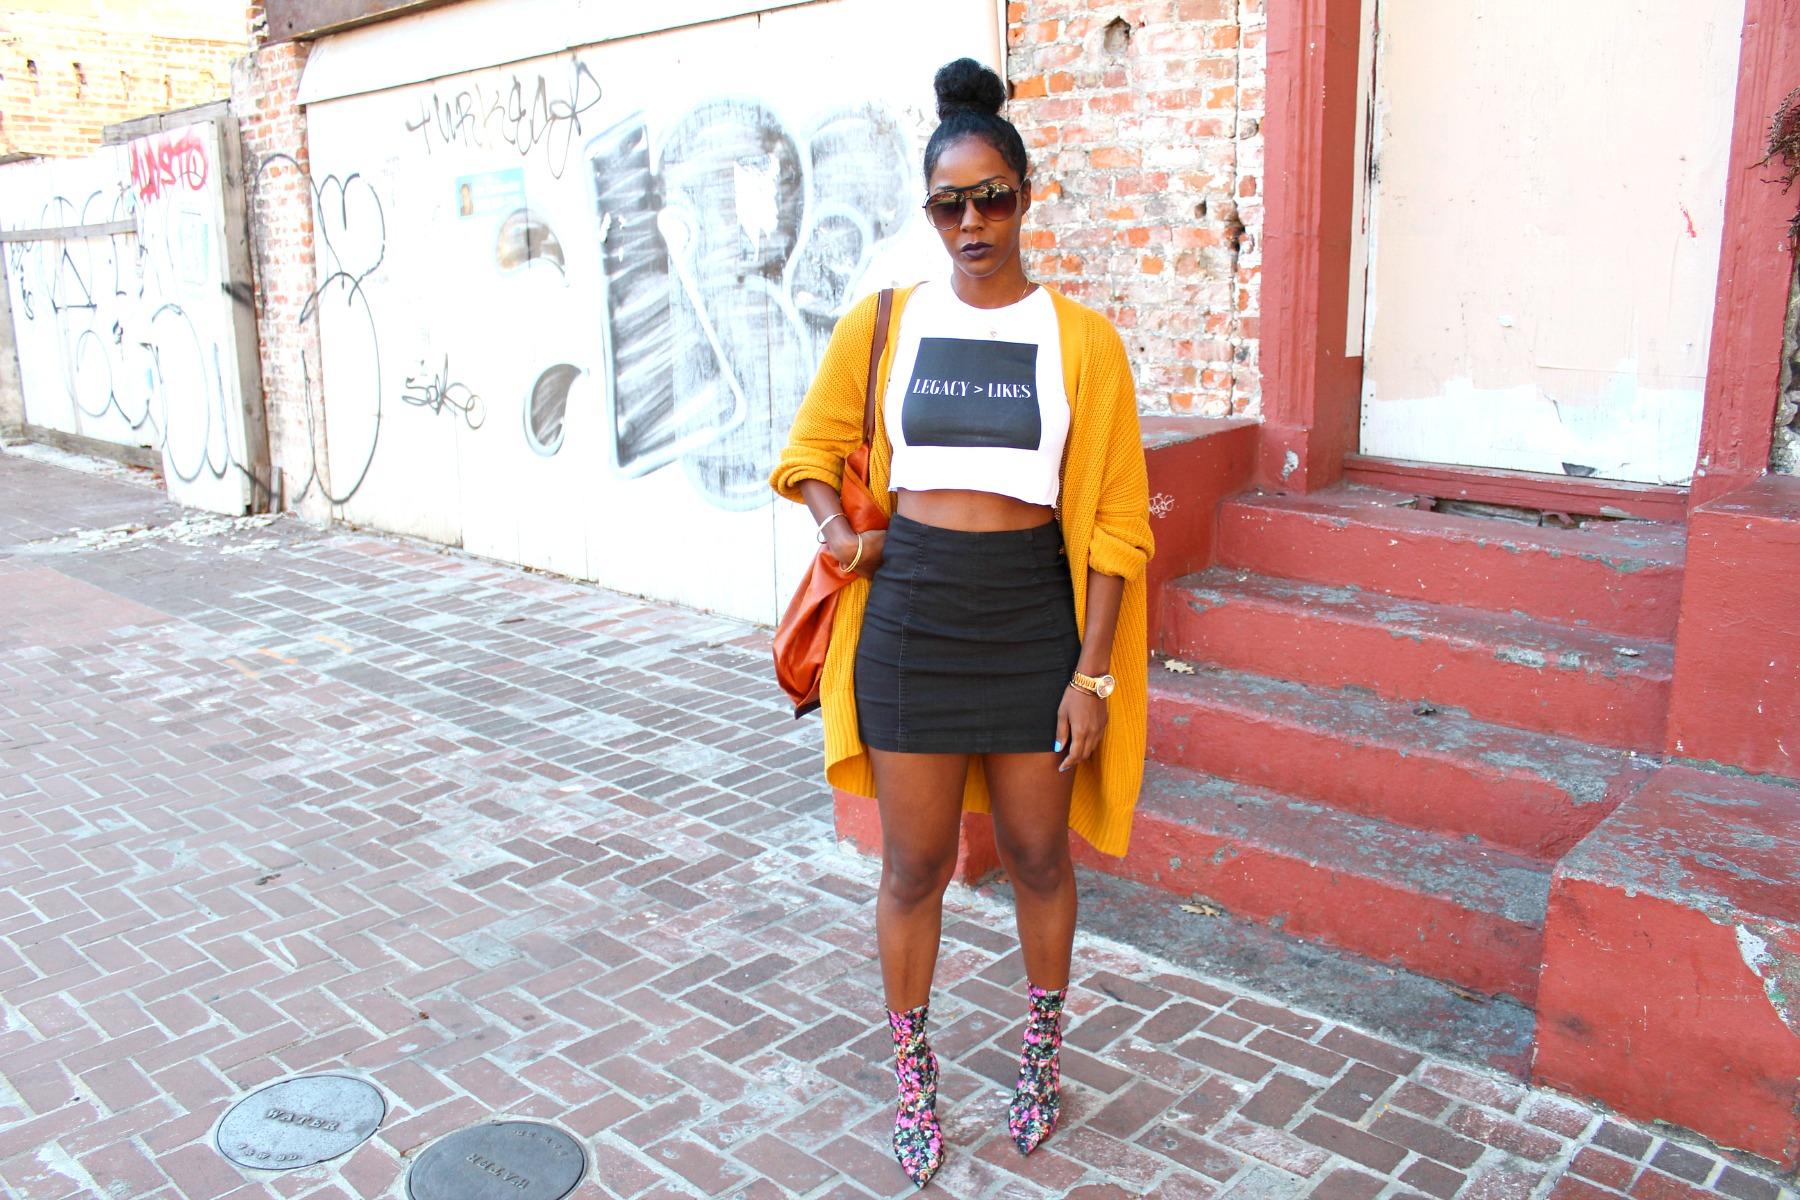 Samjah Iman    Creator of Style &Energy    Check out her blog  styleandenergy.com  and follow her  @samjahiman